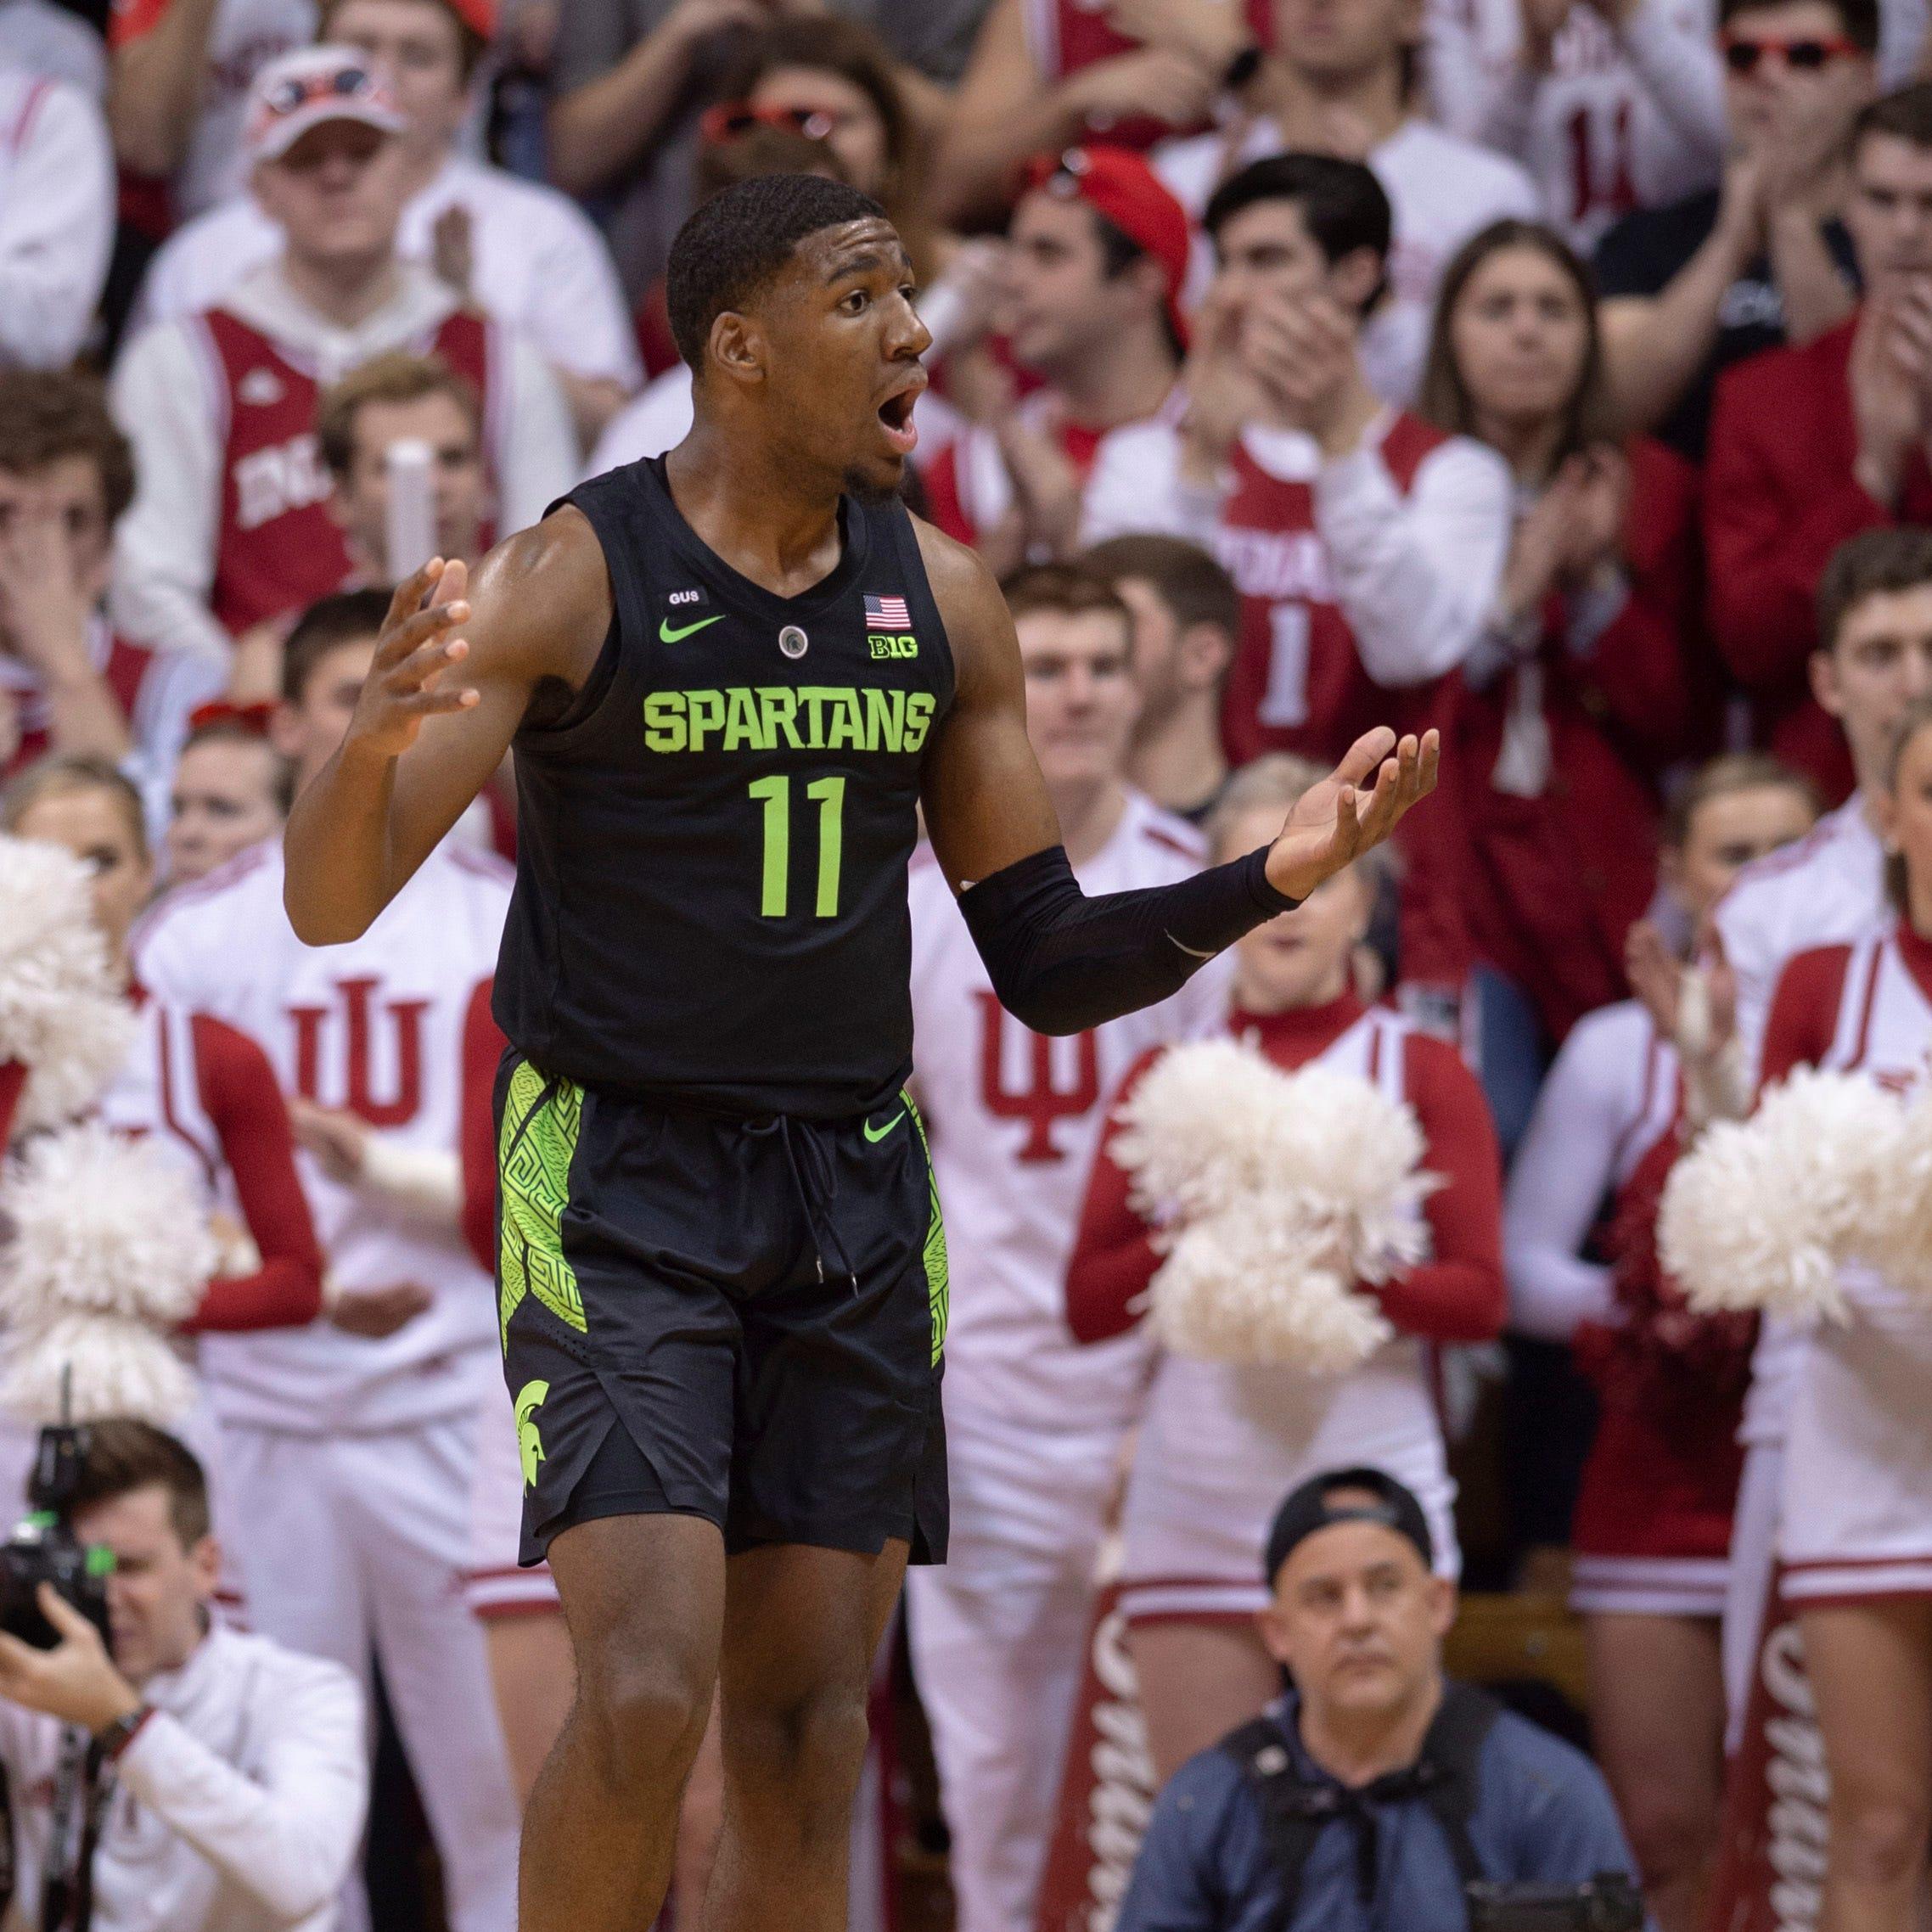 Michigan State basketball needs Aaron Henry to take shots, not hesitate